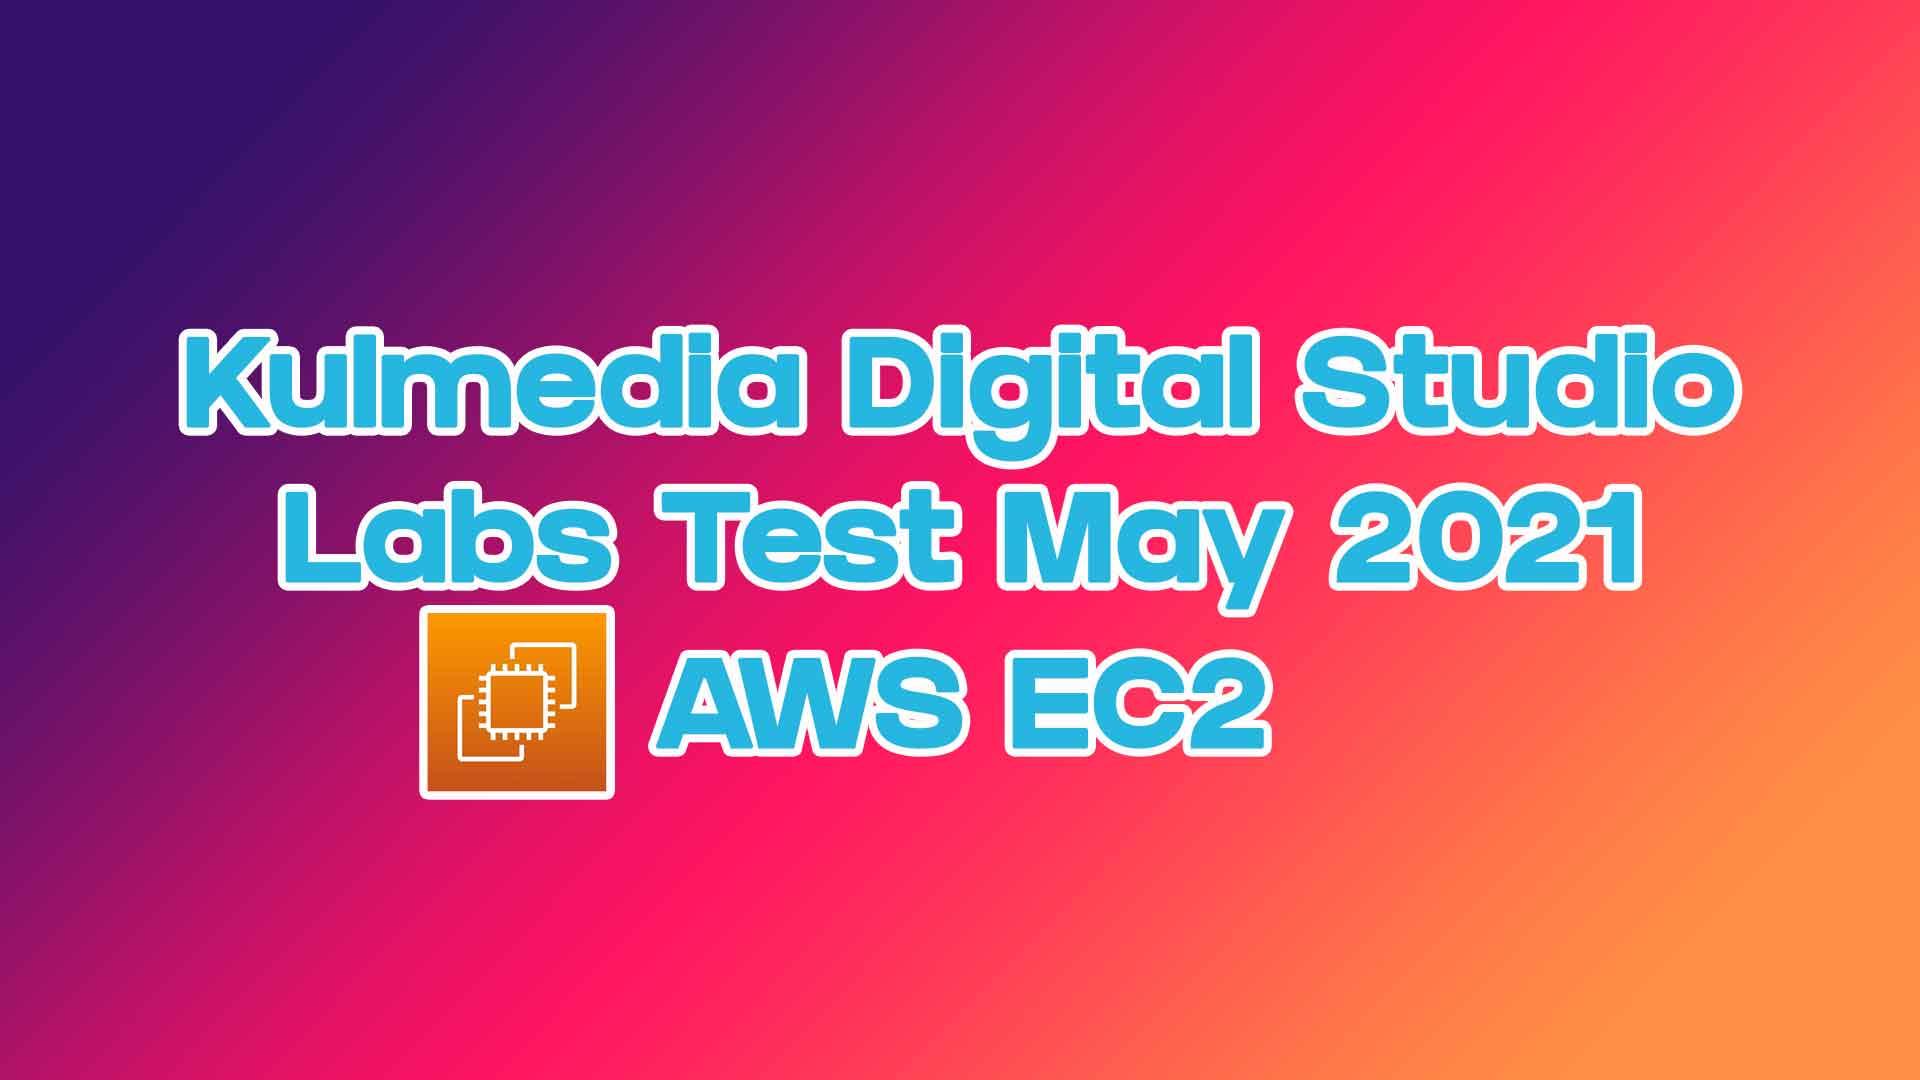 Labs Test AWS EC2 Wordpress Speed Test